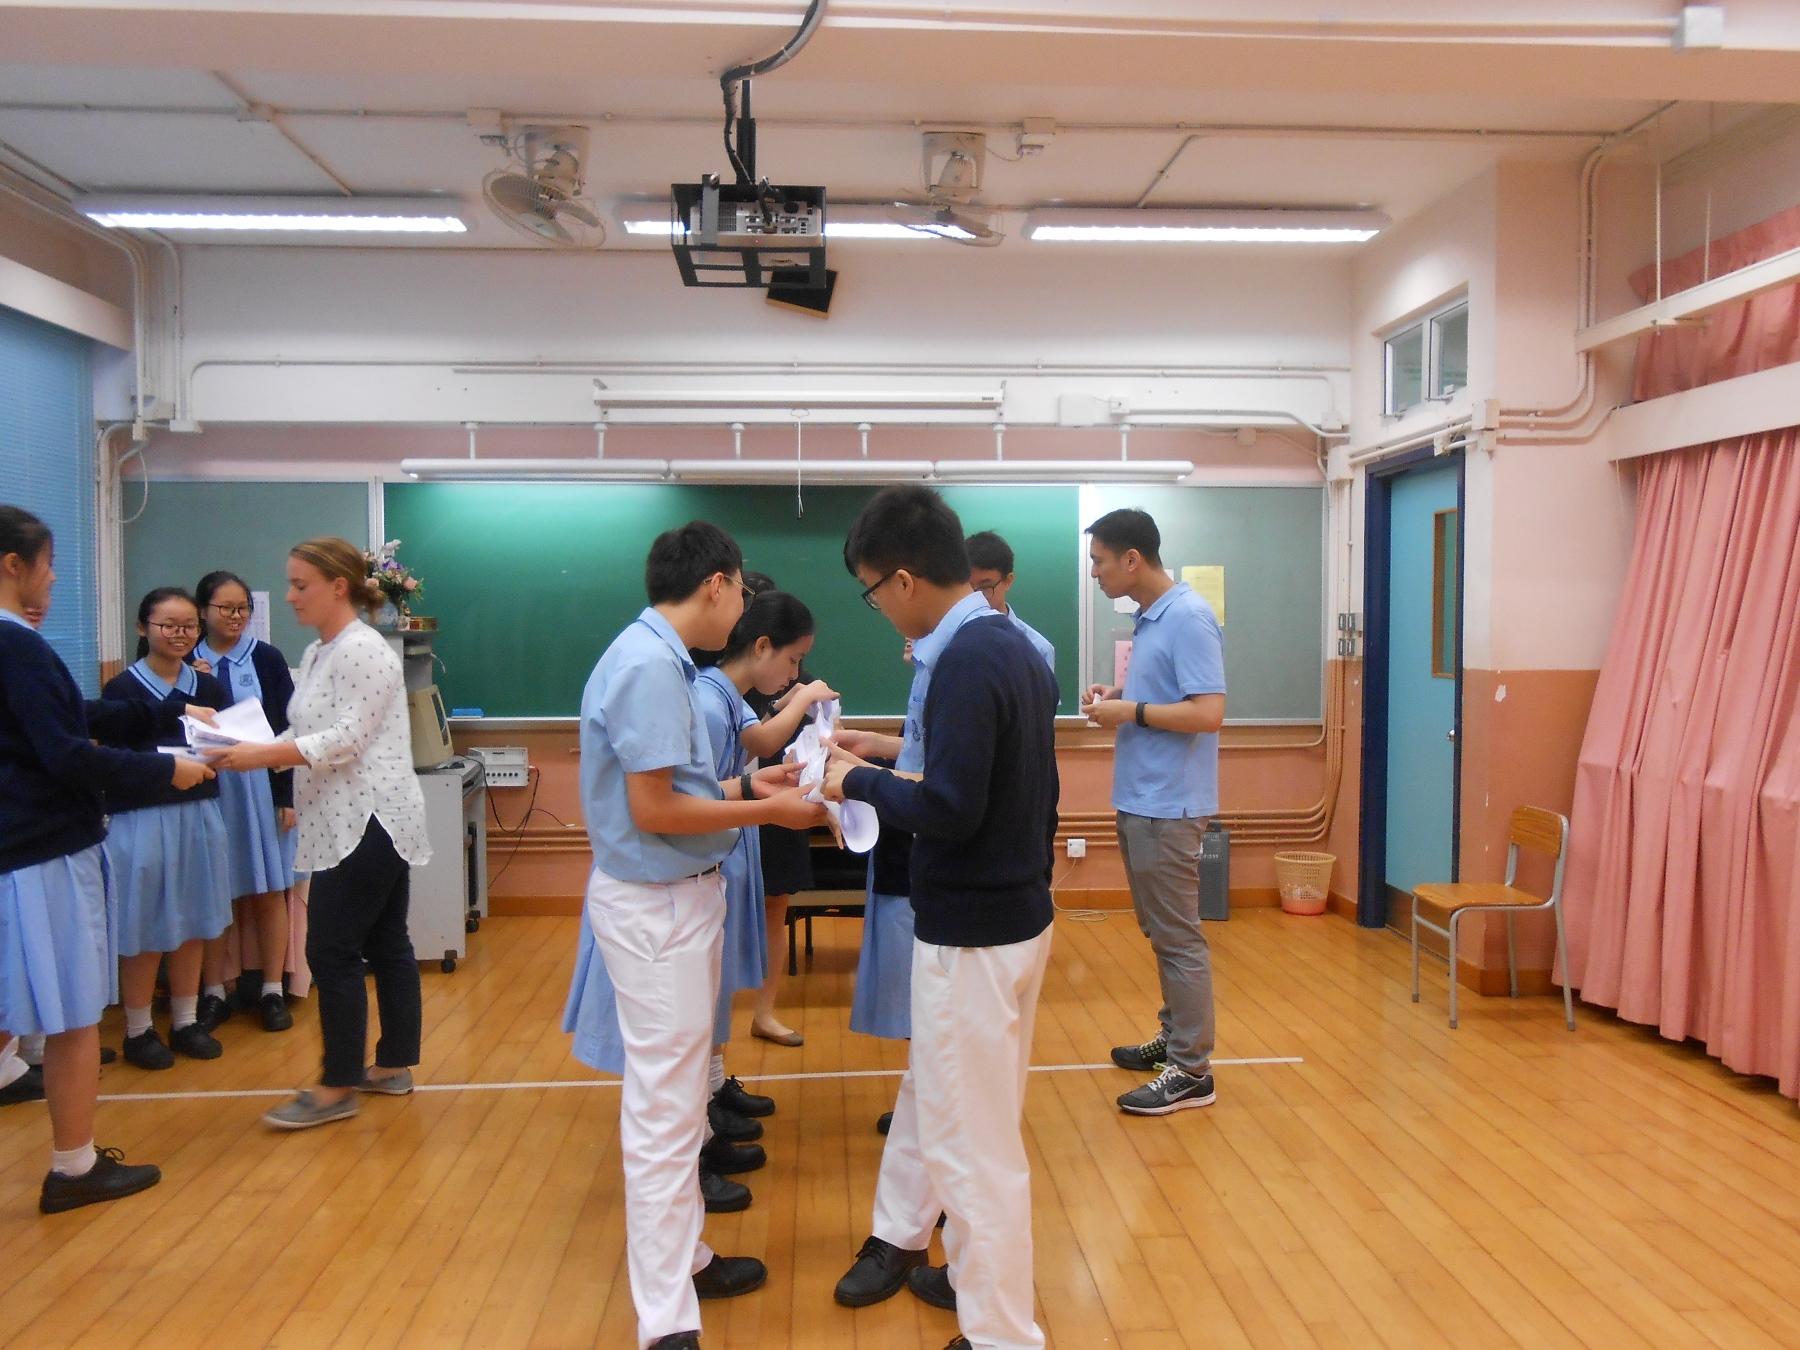 http://npc.edu.hk/sites/default/files/dscn0012_2.jpg